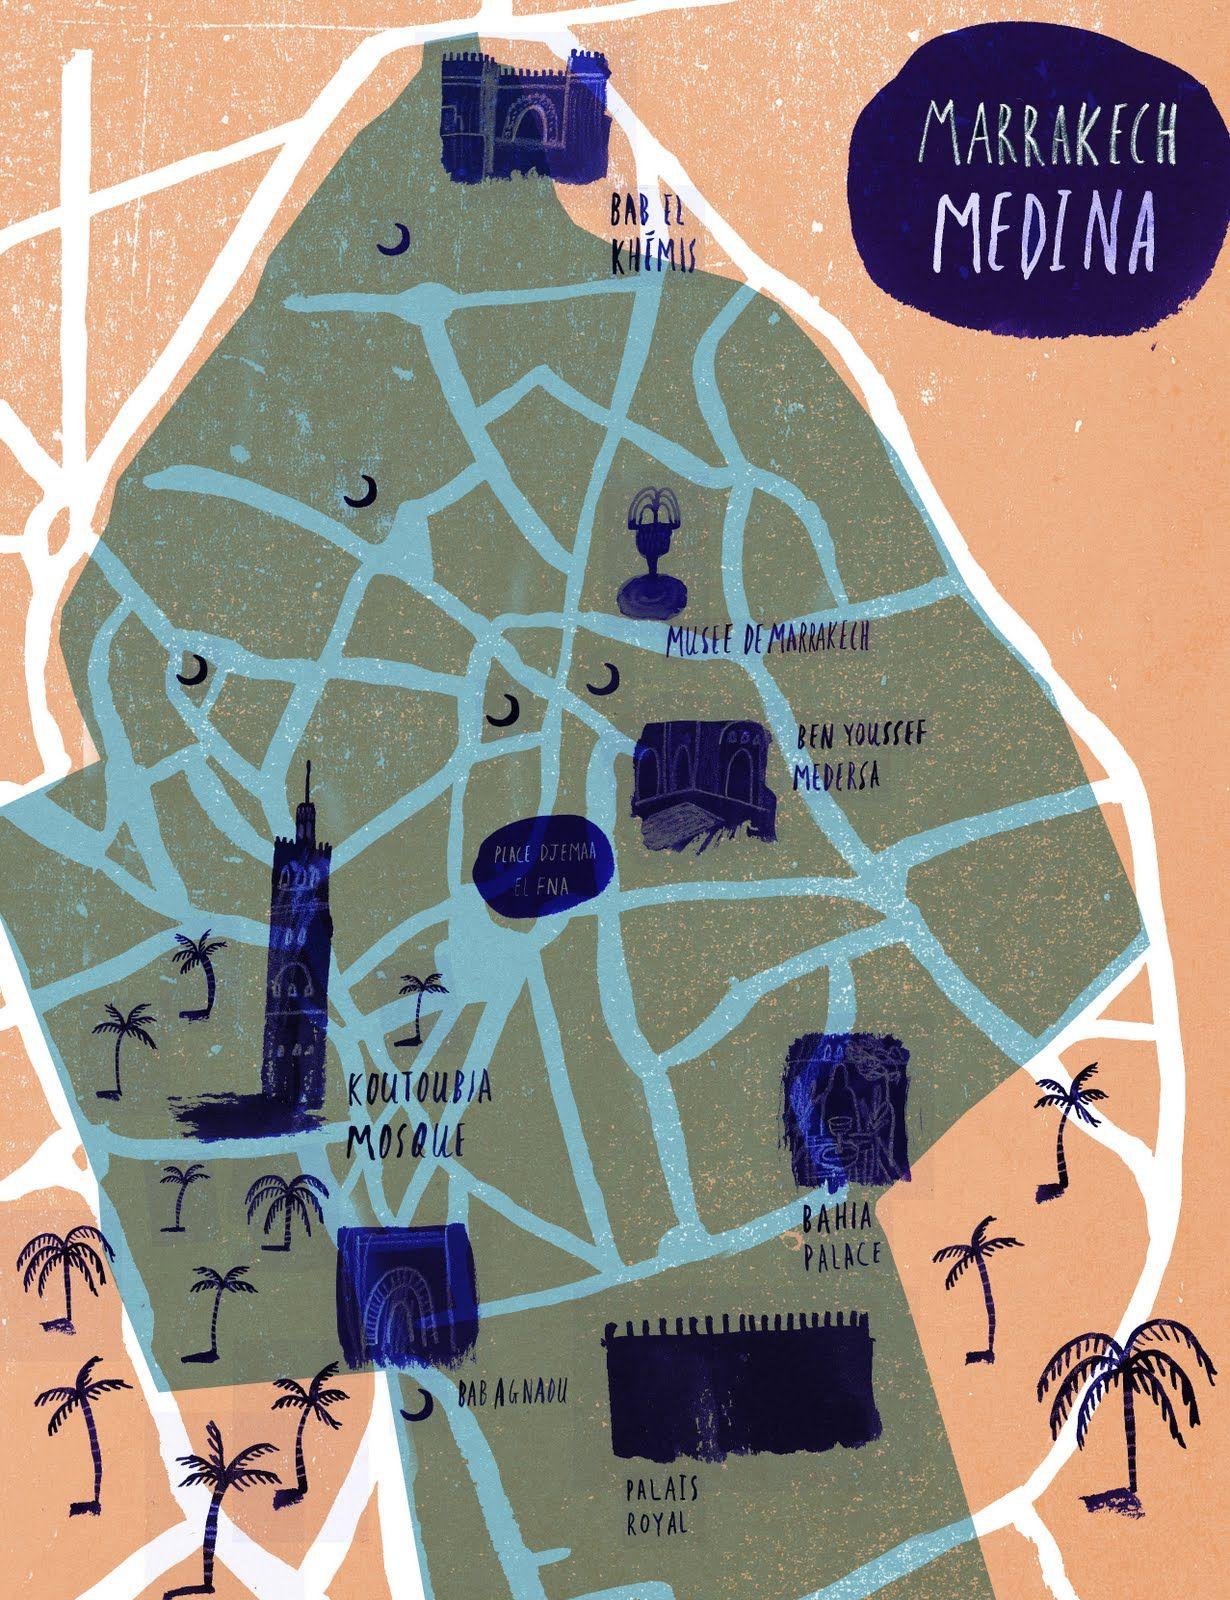 World Map Of Morocco%0A Marrakech Medina Map by Laura Bird